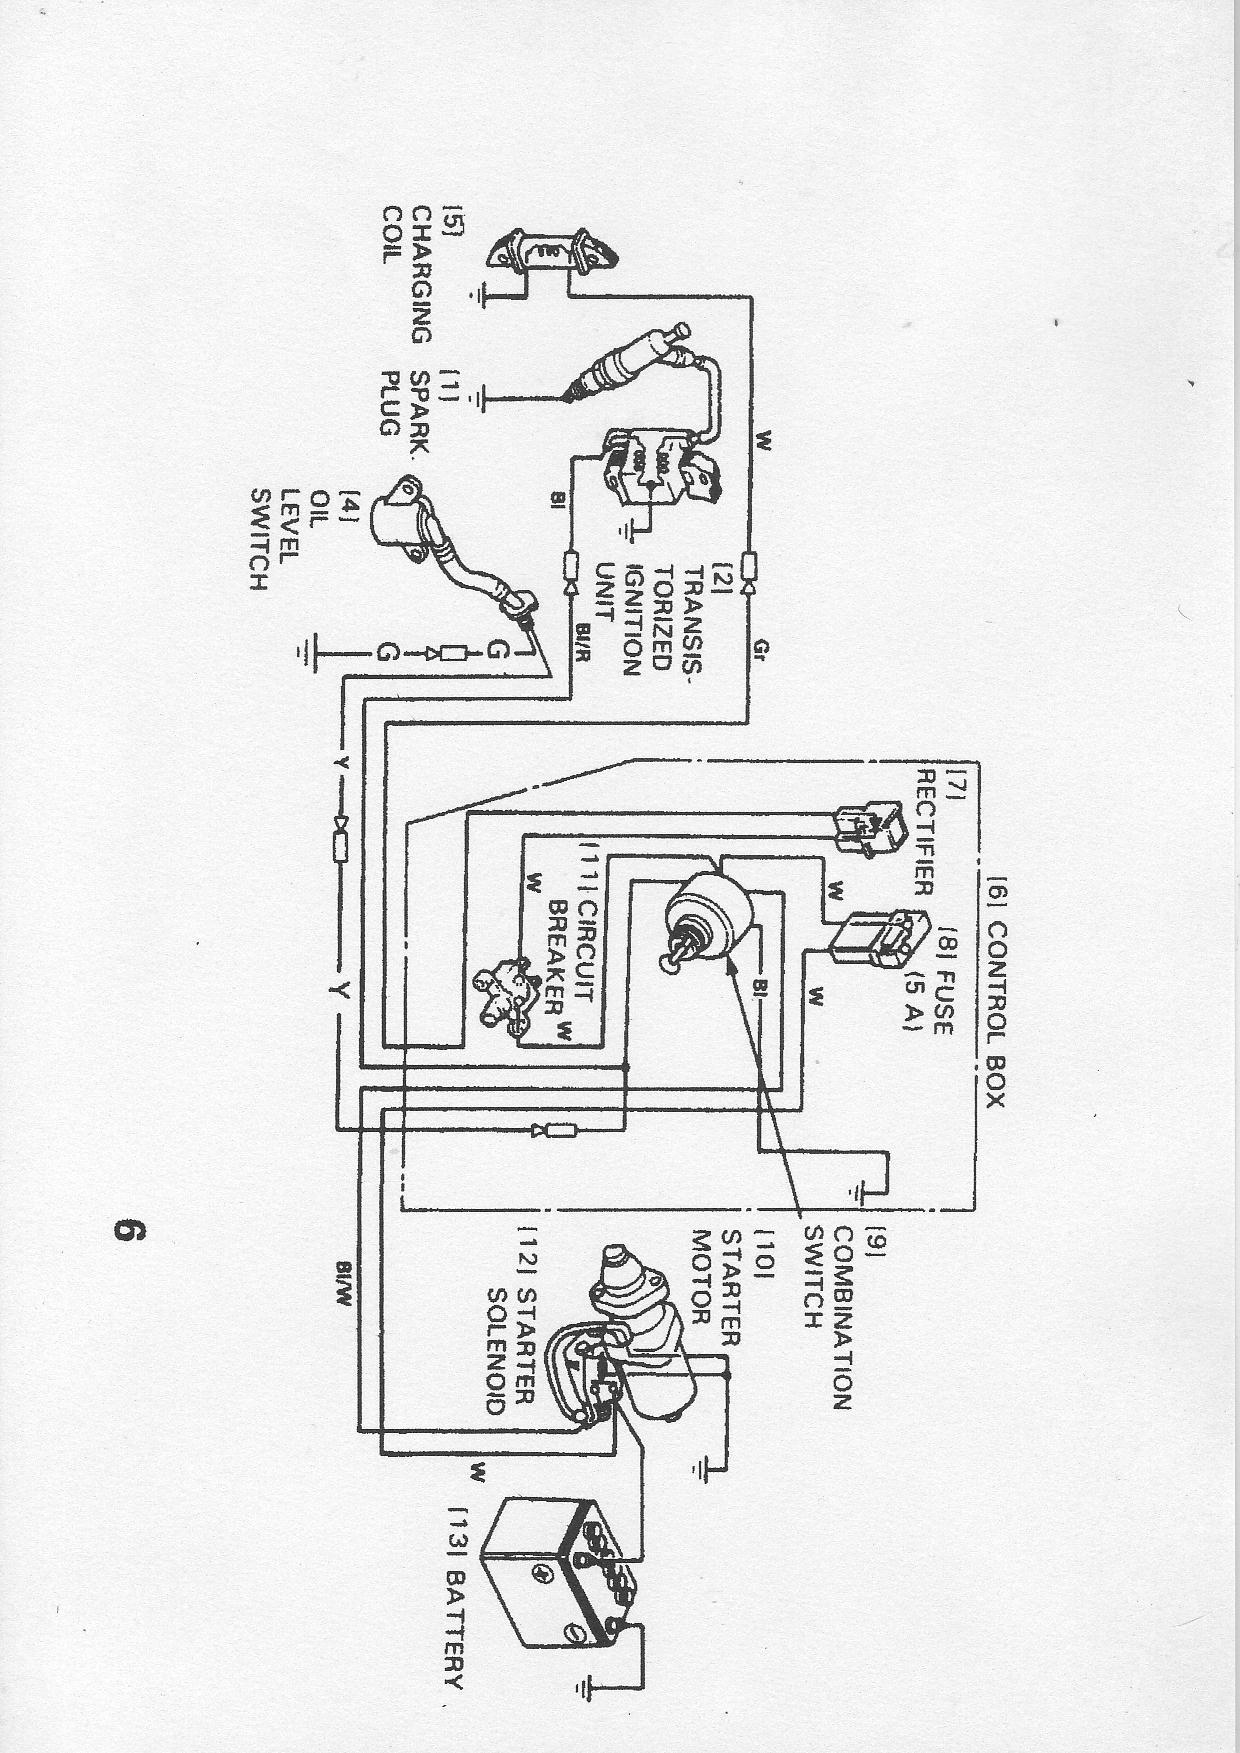 hight resolution of useful information honda gx160 electric start wiring diagram